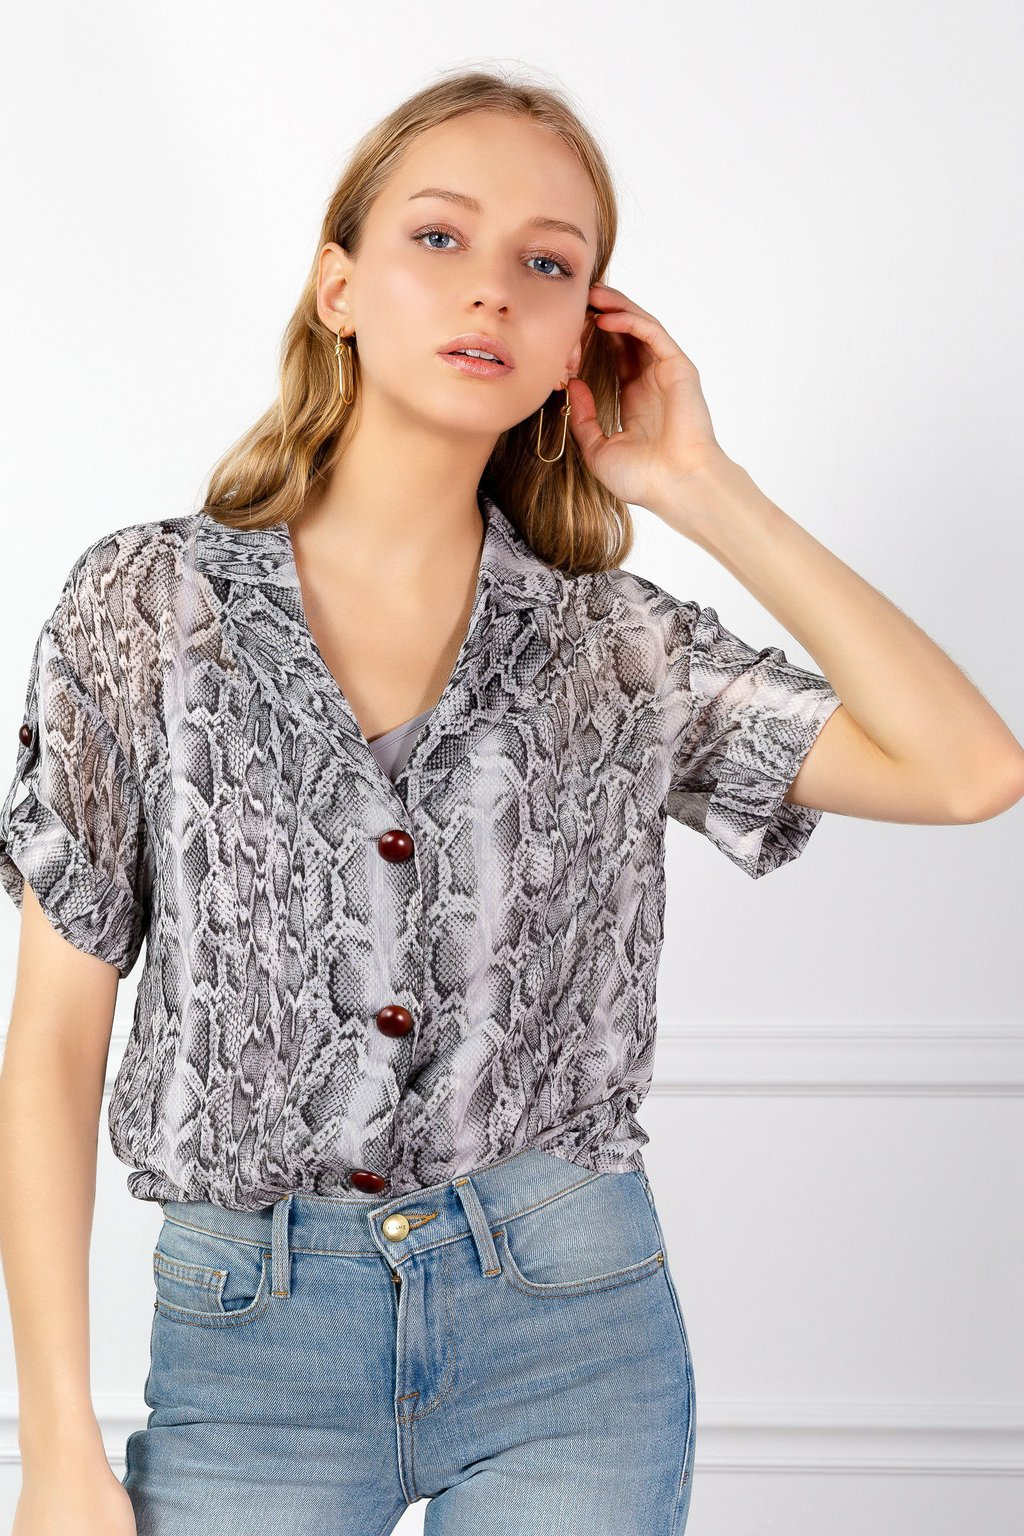 Snakeskin Shirt by J.ING LA women's fashion